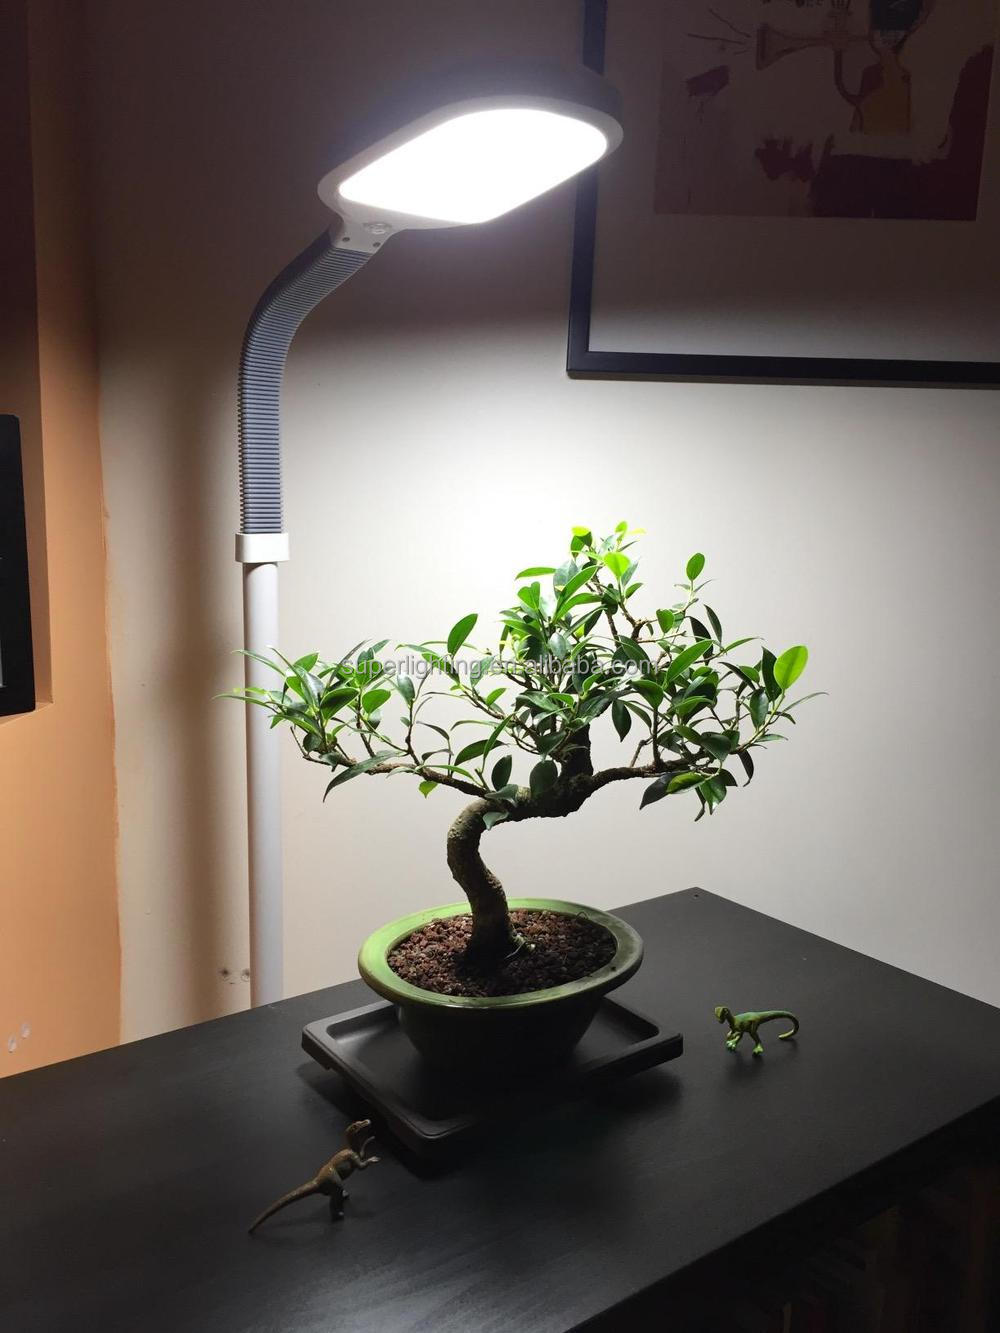 Dimmbare sonnenlicht energiespar flexible touch sensor led ...